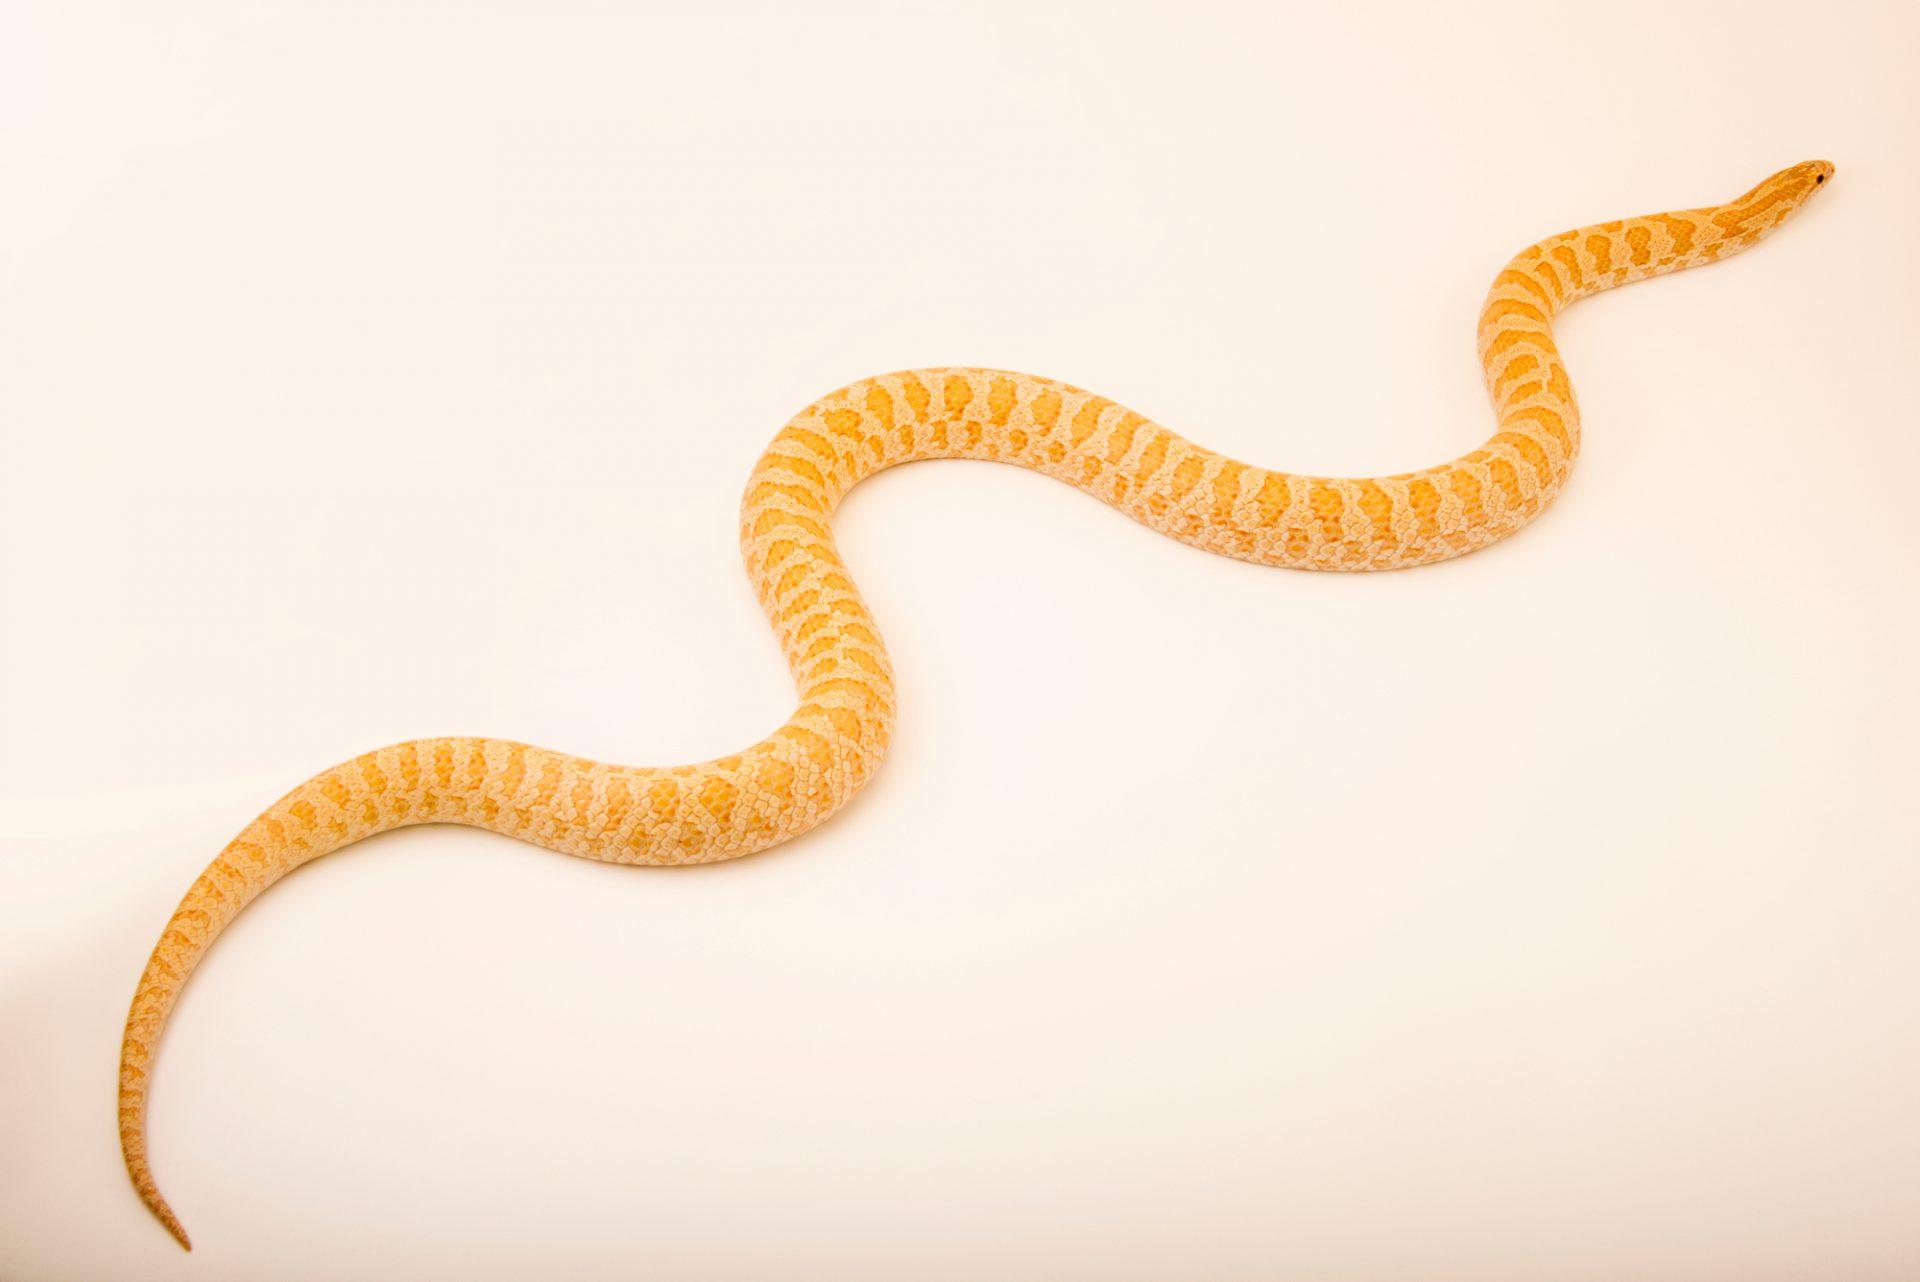 Photo: Albino Prairie King Snake (Lampropeltis calligaster) at the Singapore Zoo.